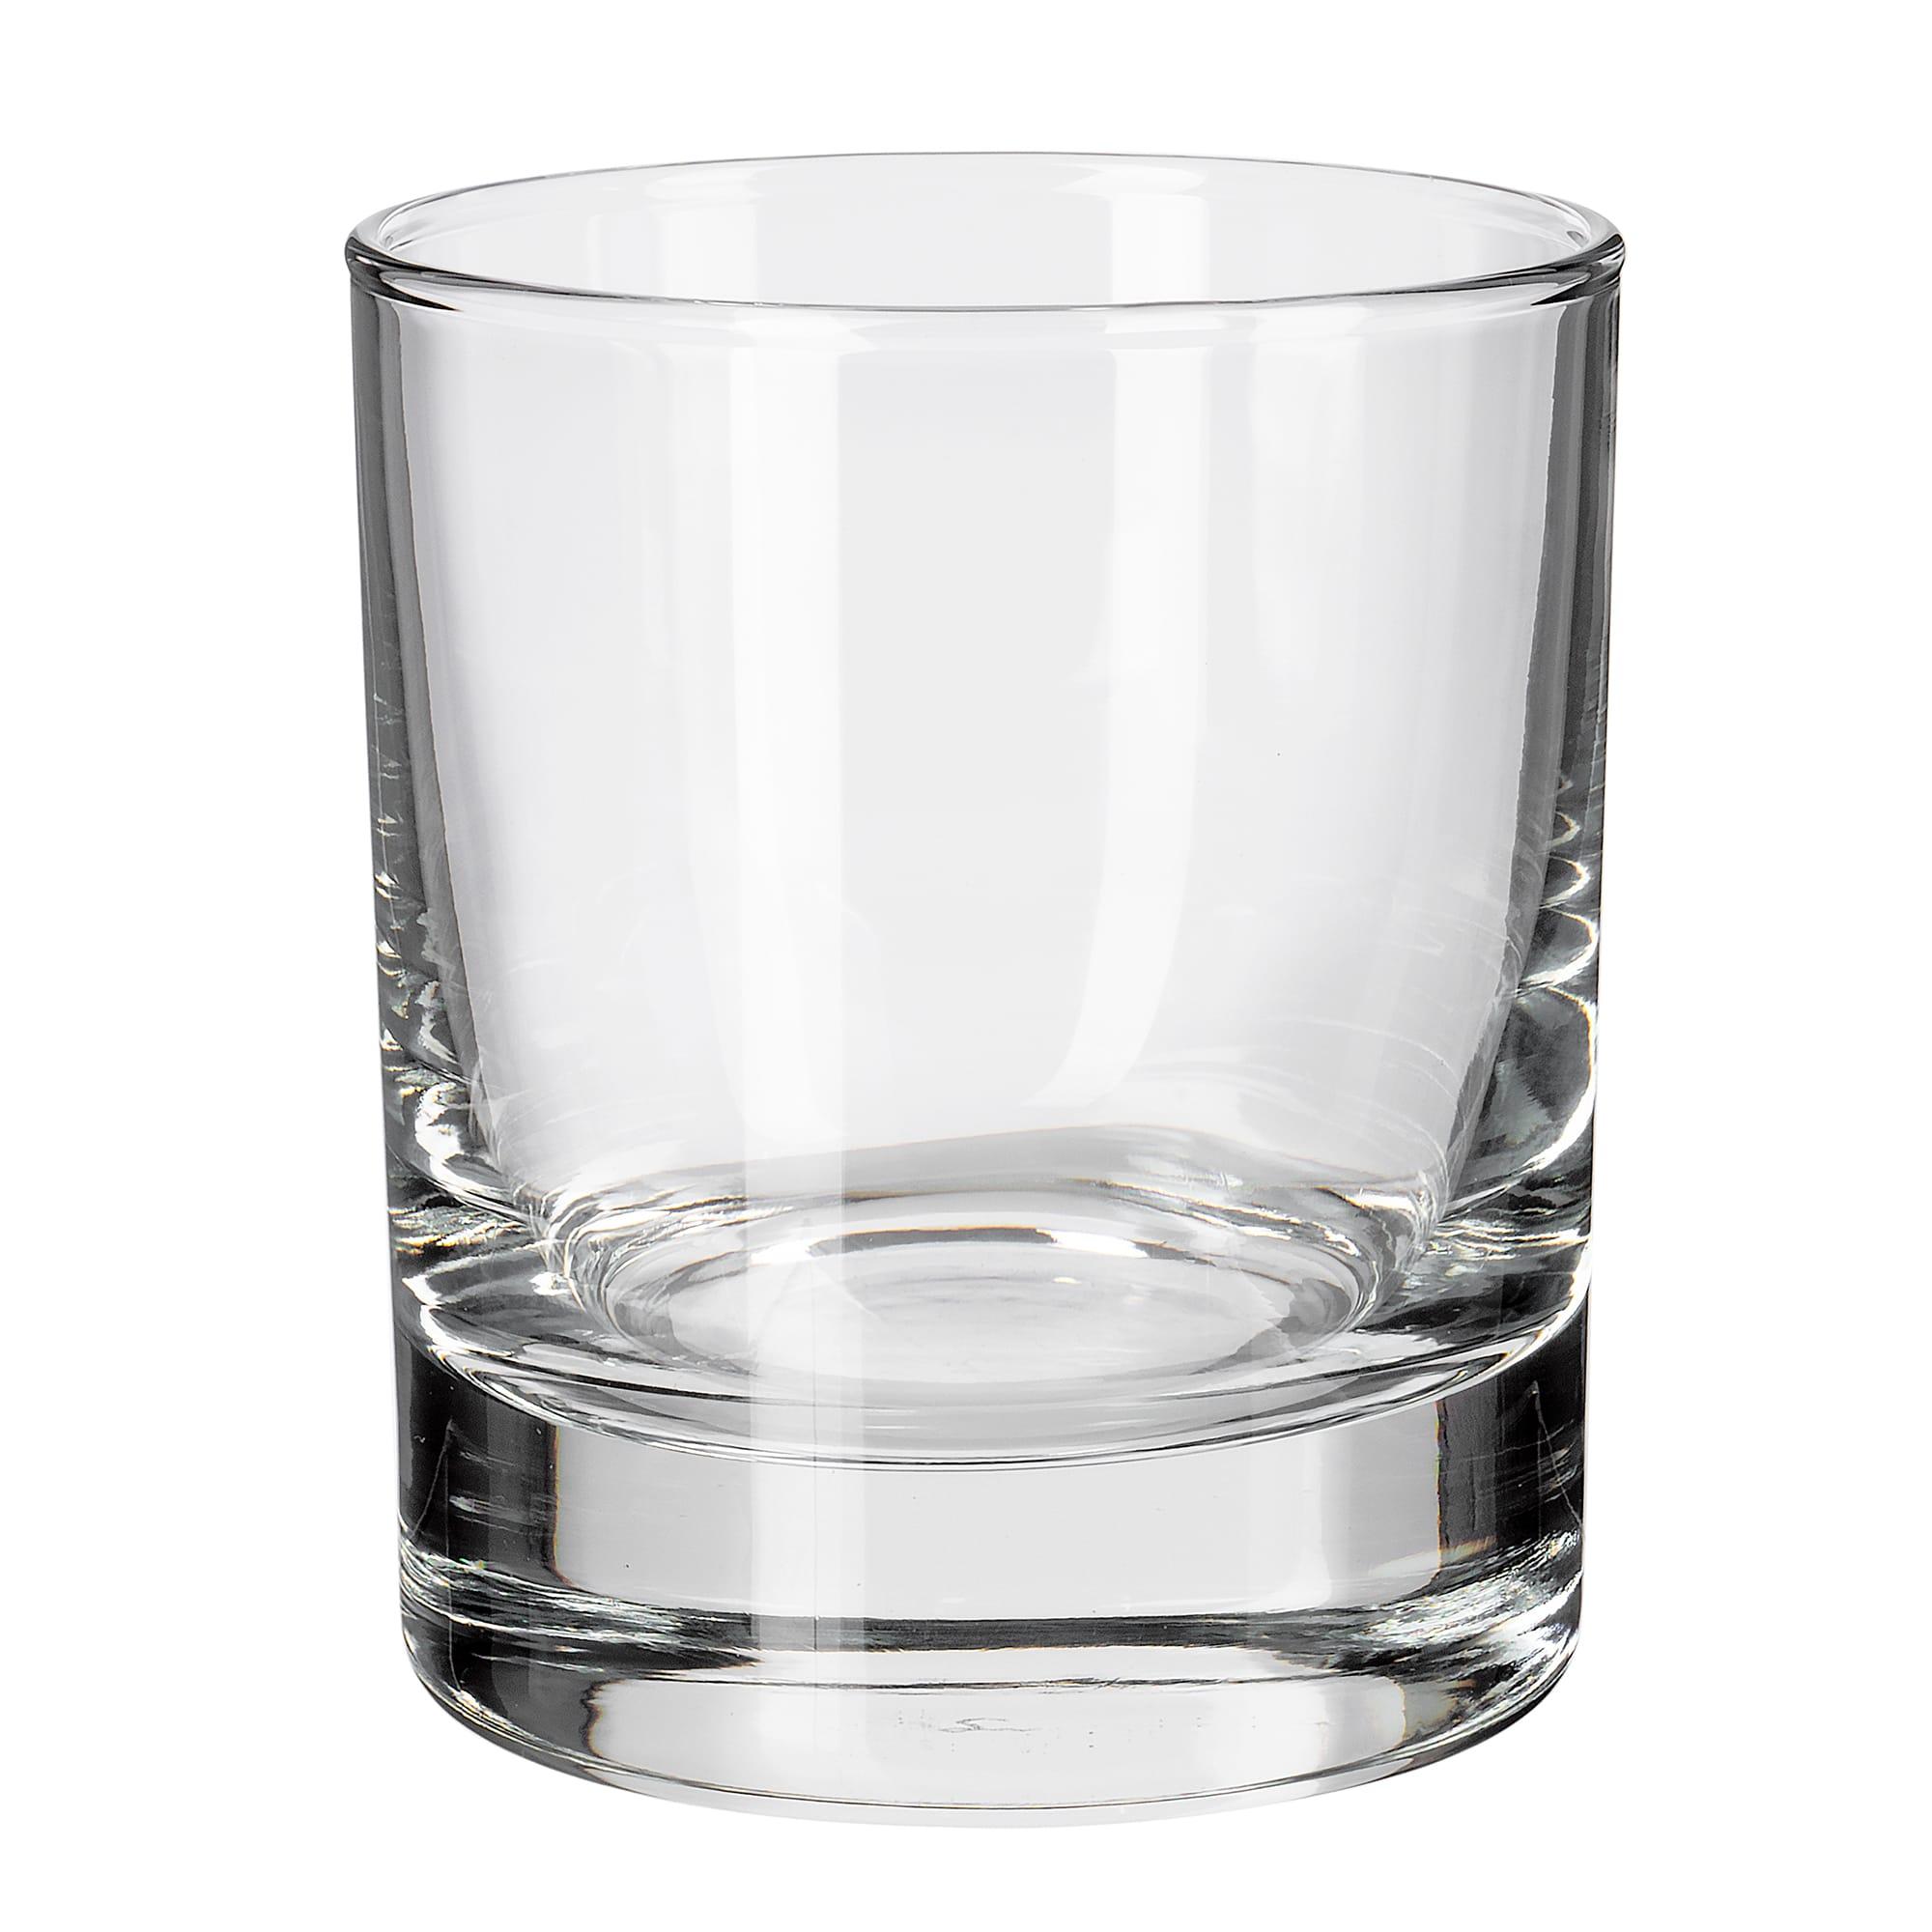 Libbey 2522 7-oz Old Fashion Glass - Chicago